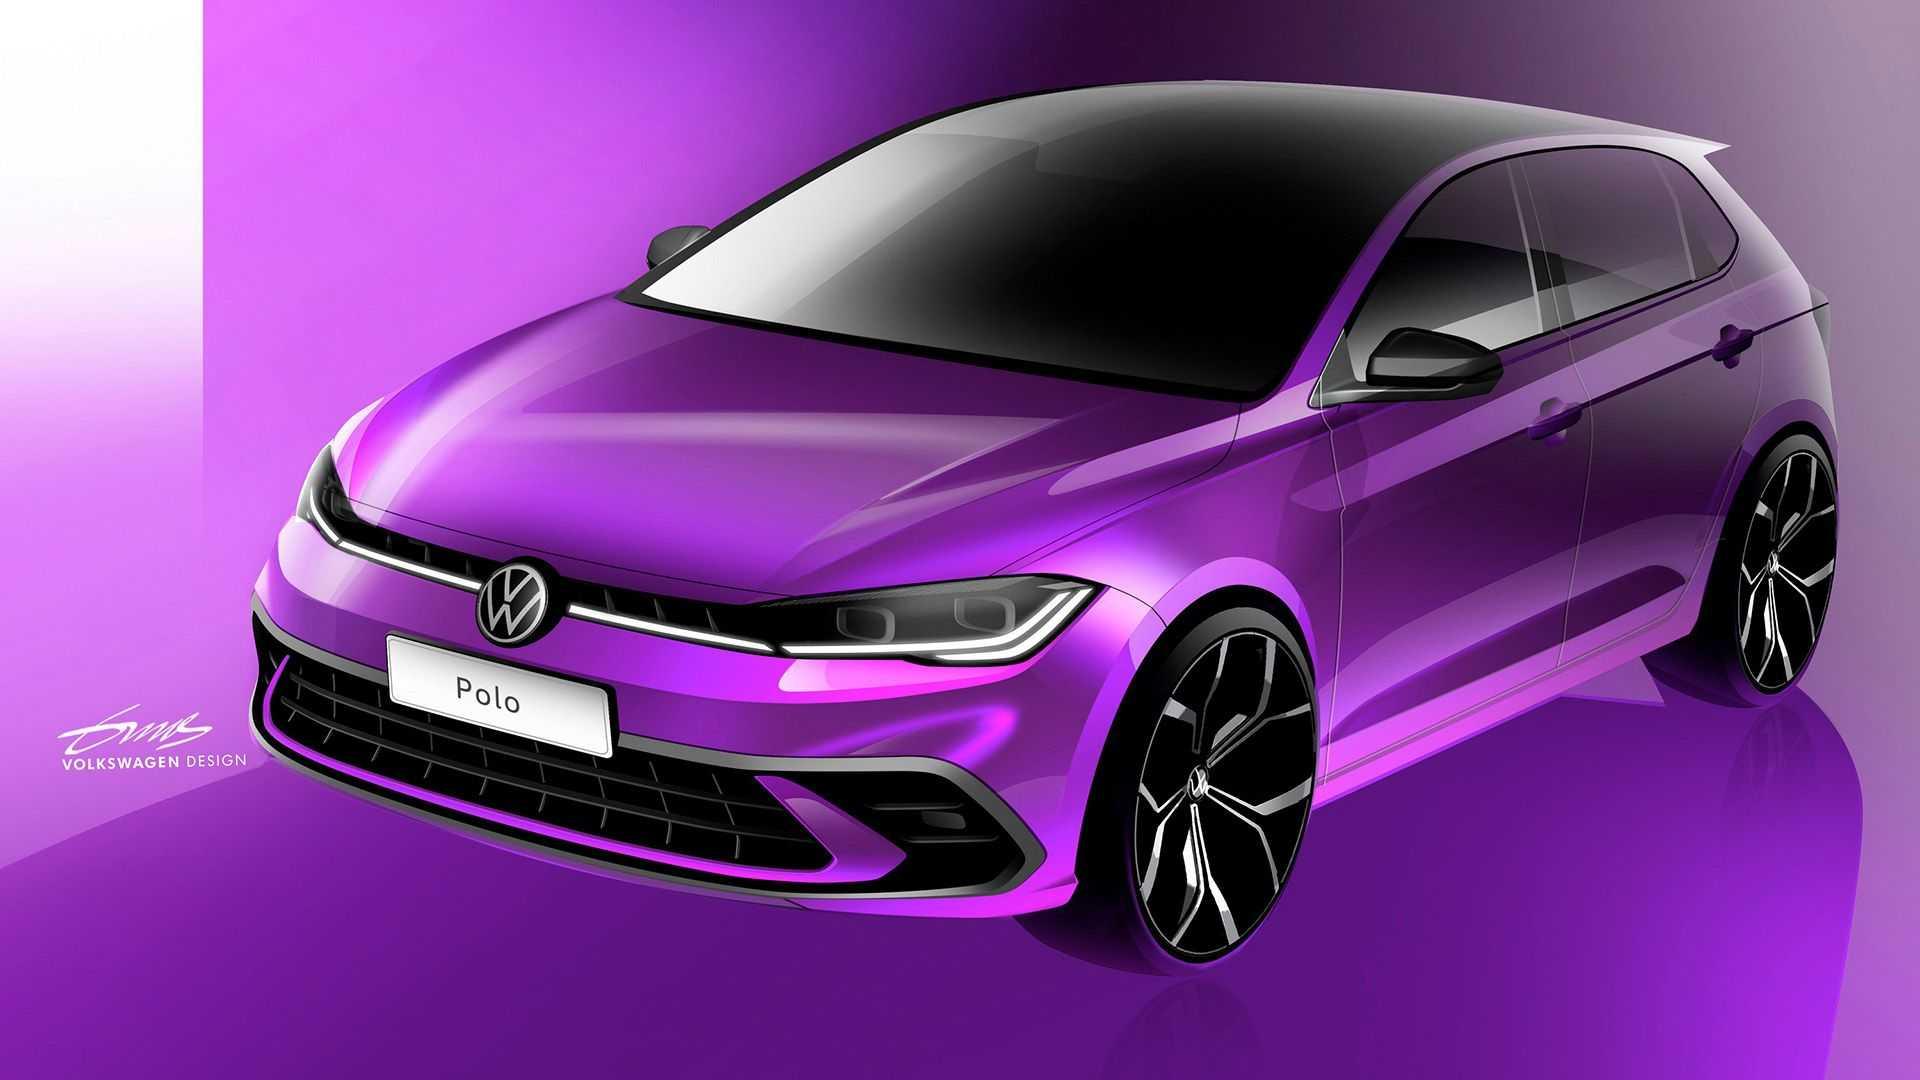 Volkswagen-Polo-facelift-42